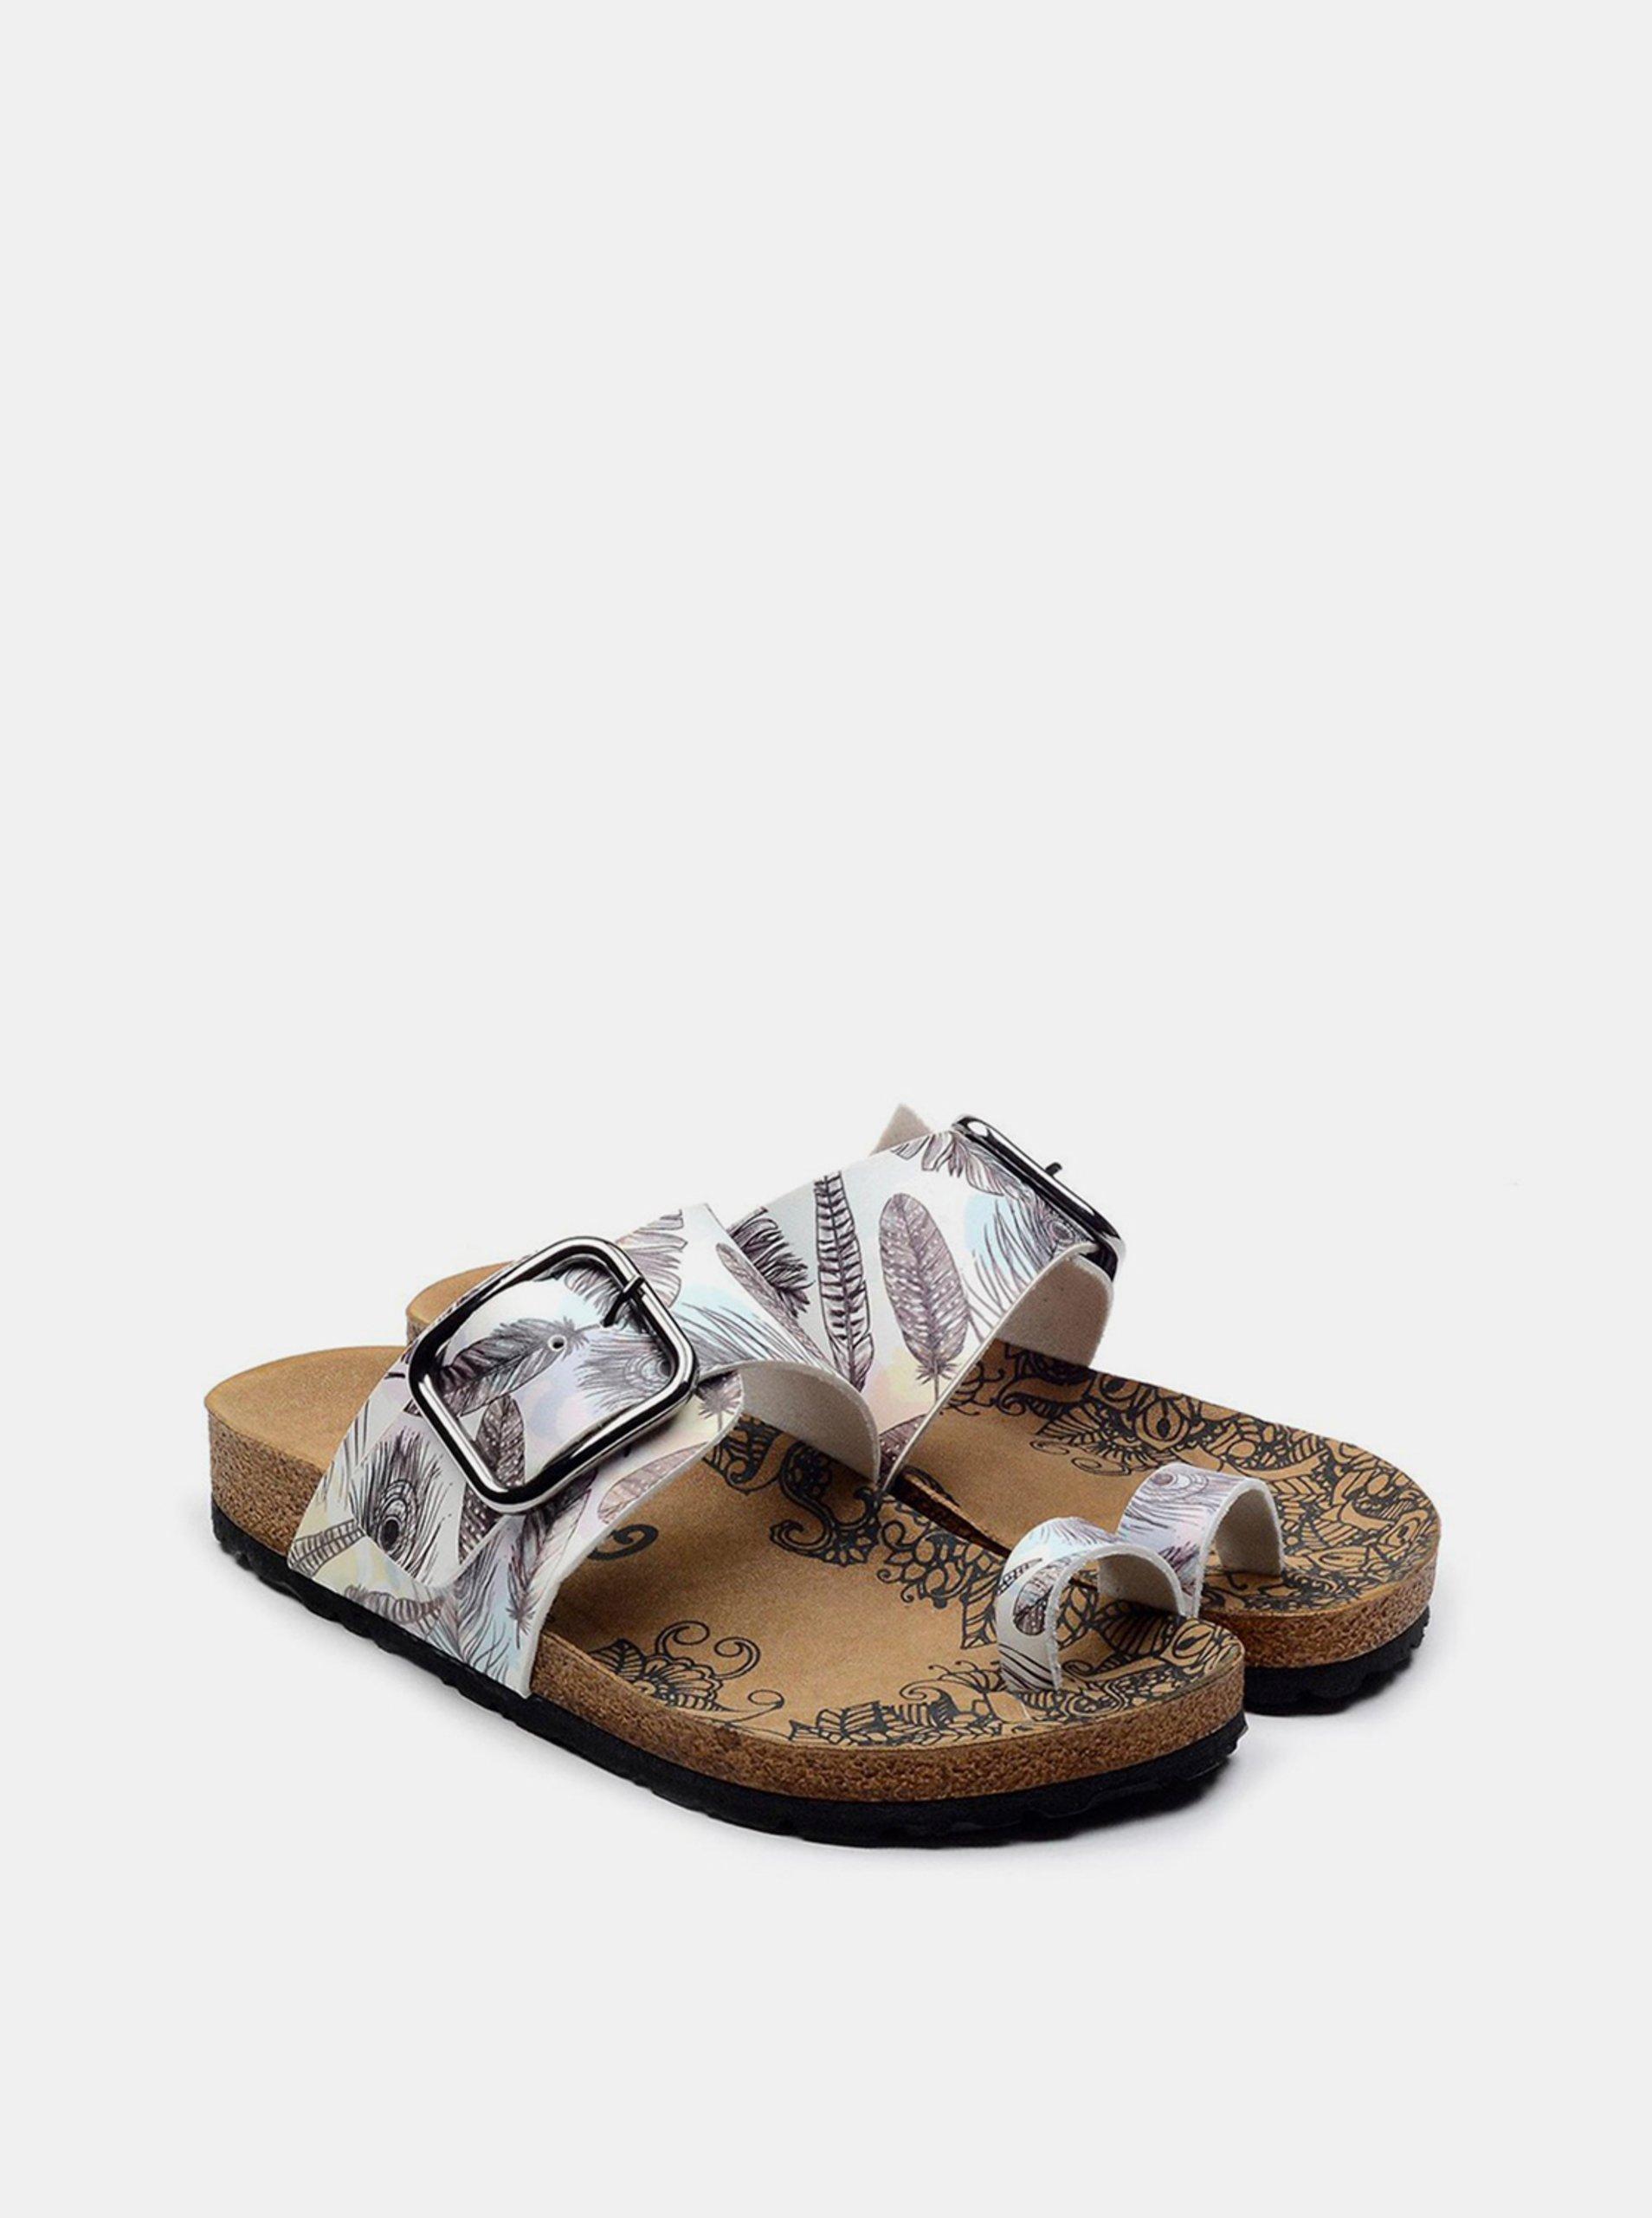 Calceo biele šľapky Thong Sandals Feather.